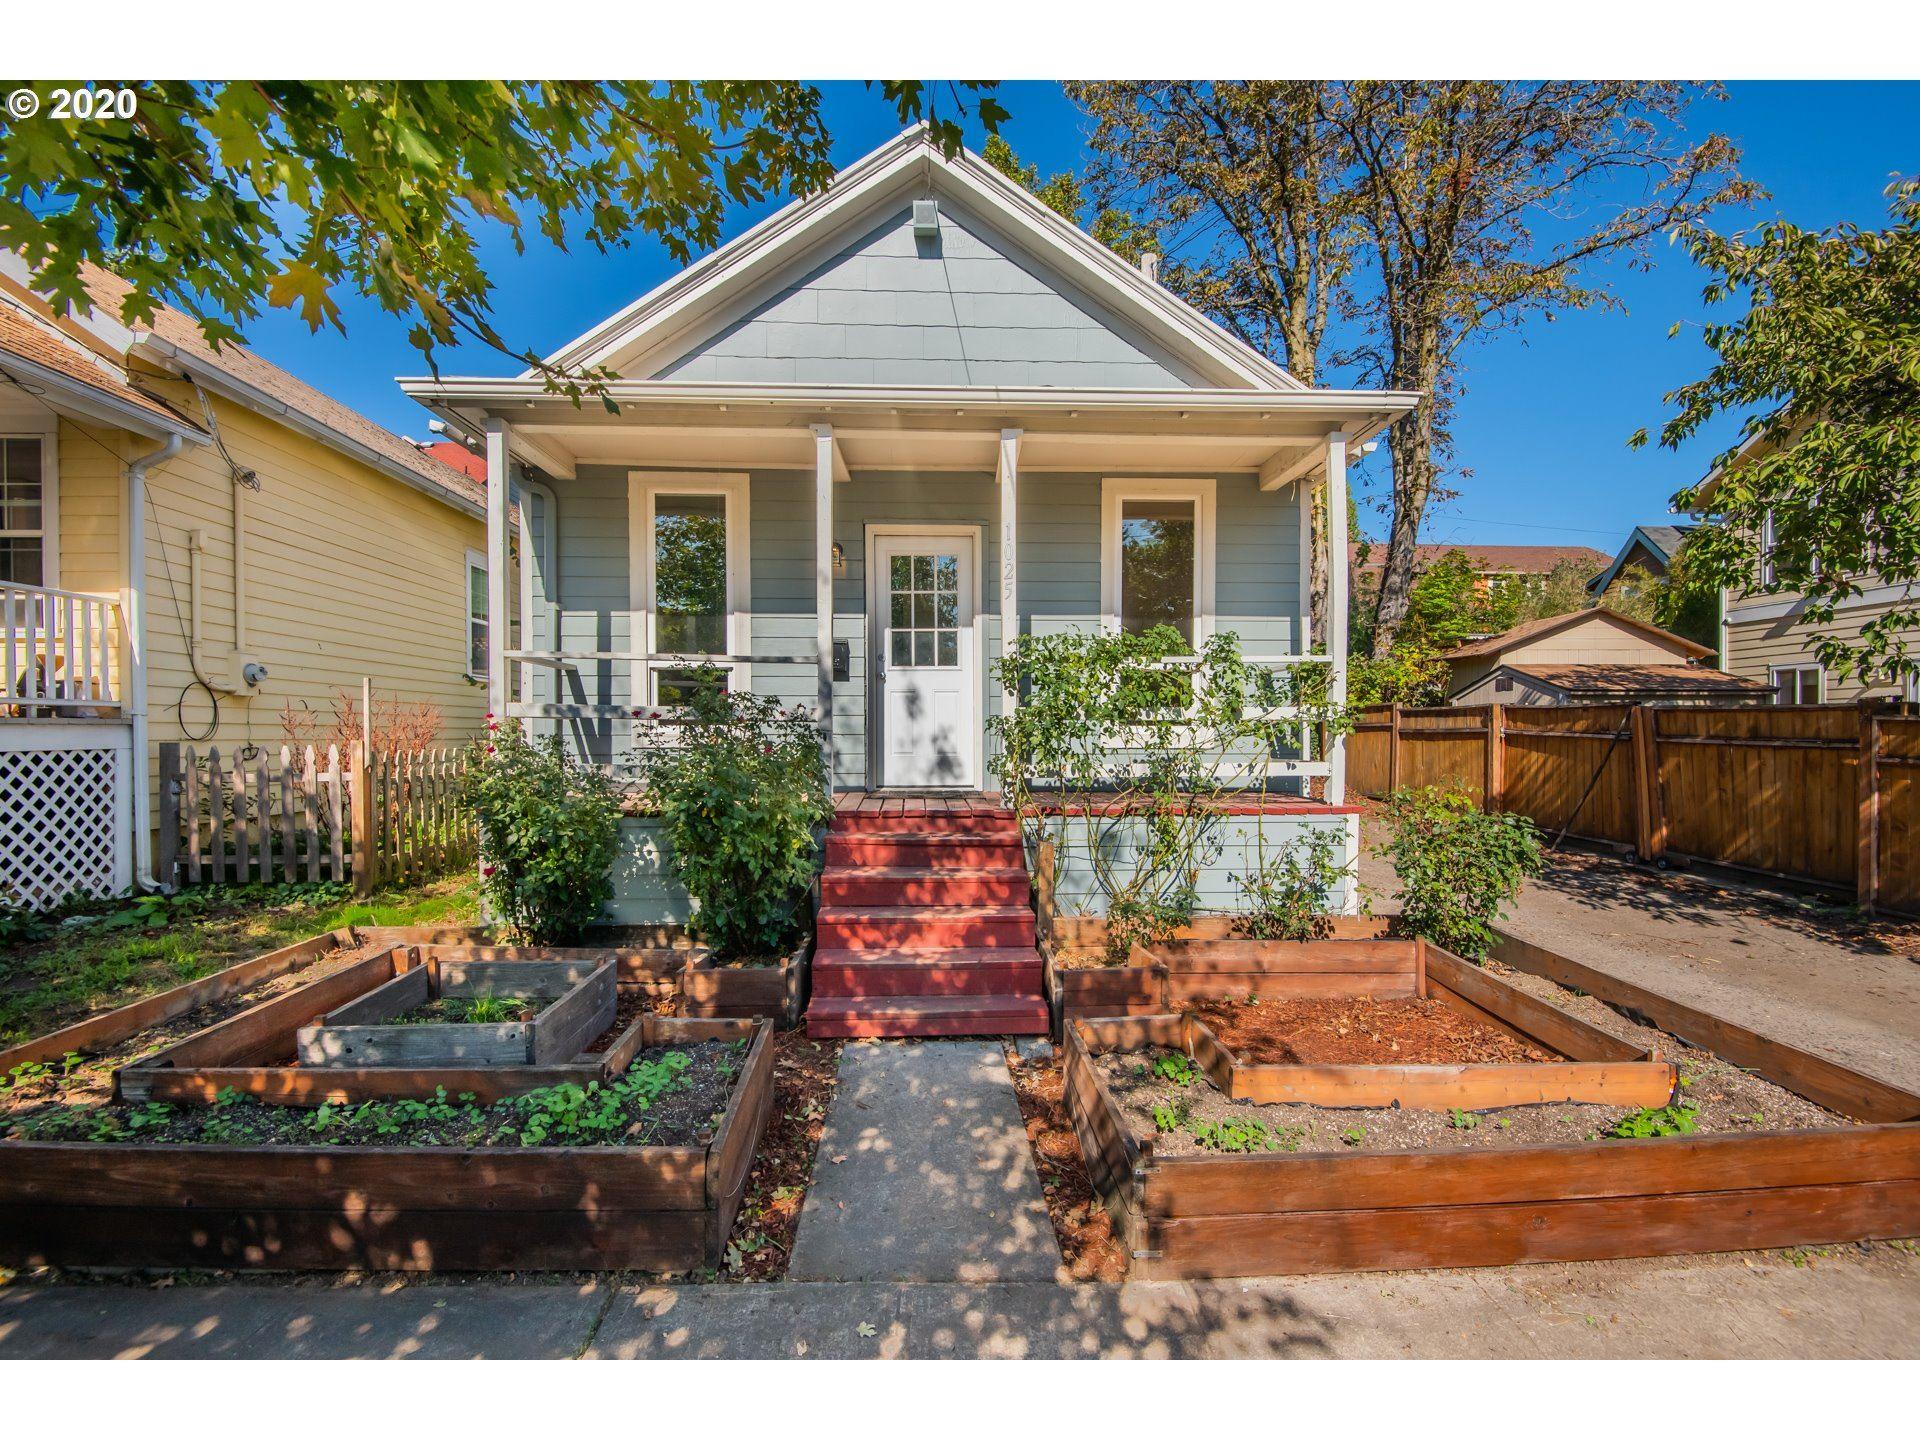 1025 N SHAVER ST, Portland, OR 97227 - MLS#: 20644588